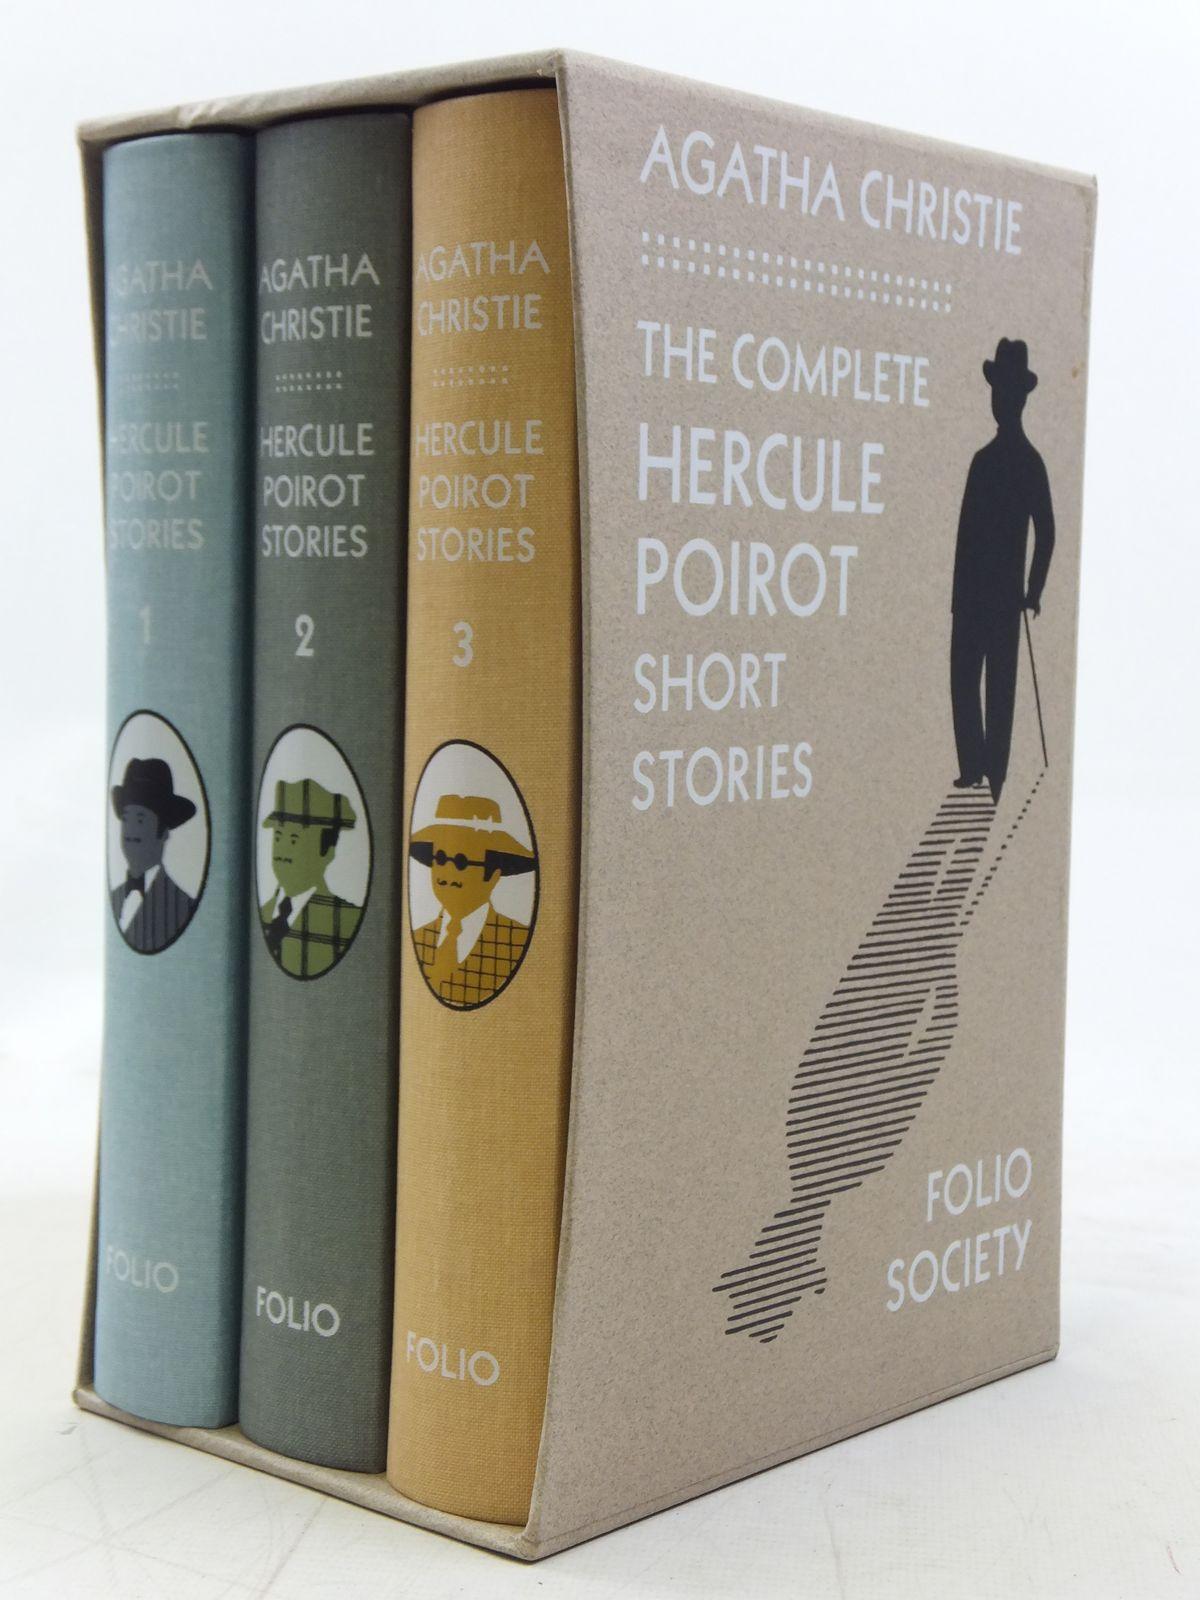 agatha christie FS complete hercule poirot short stories